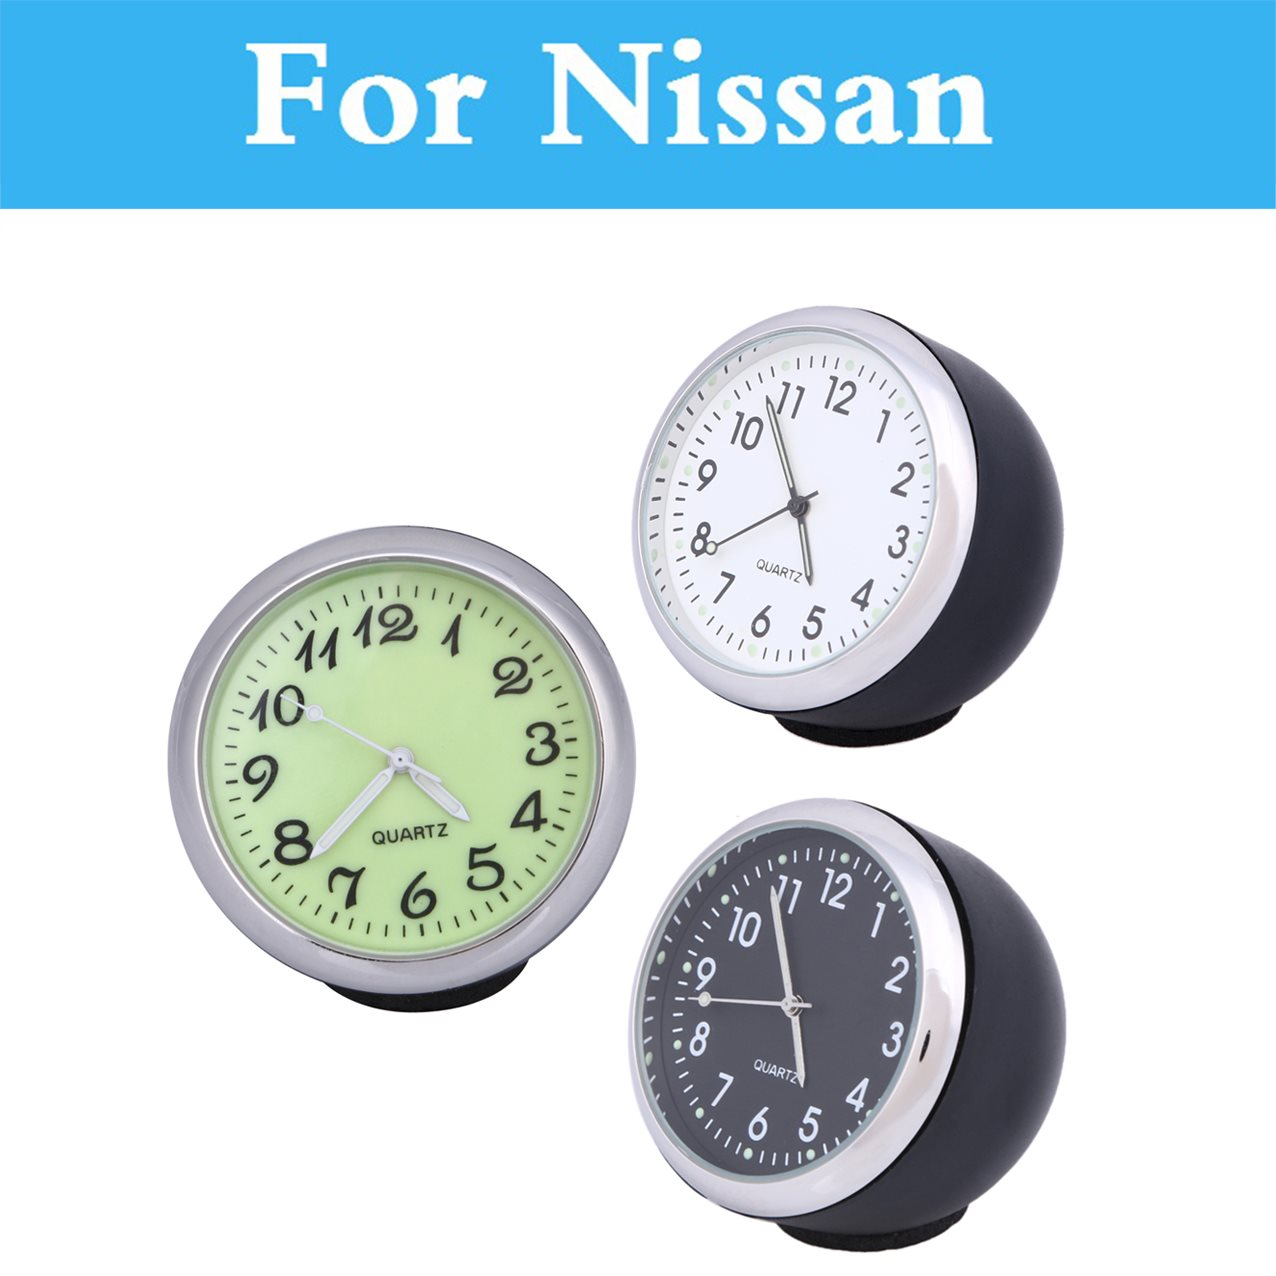 Nissan Altima: Clock